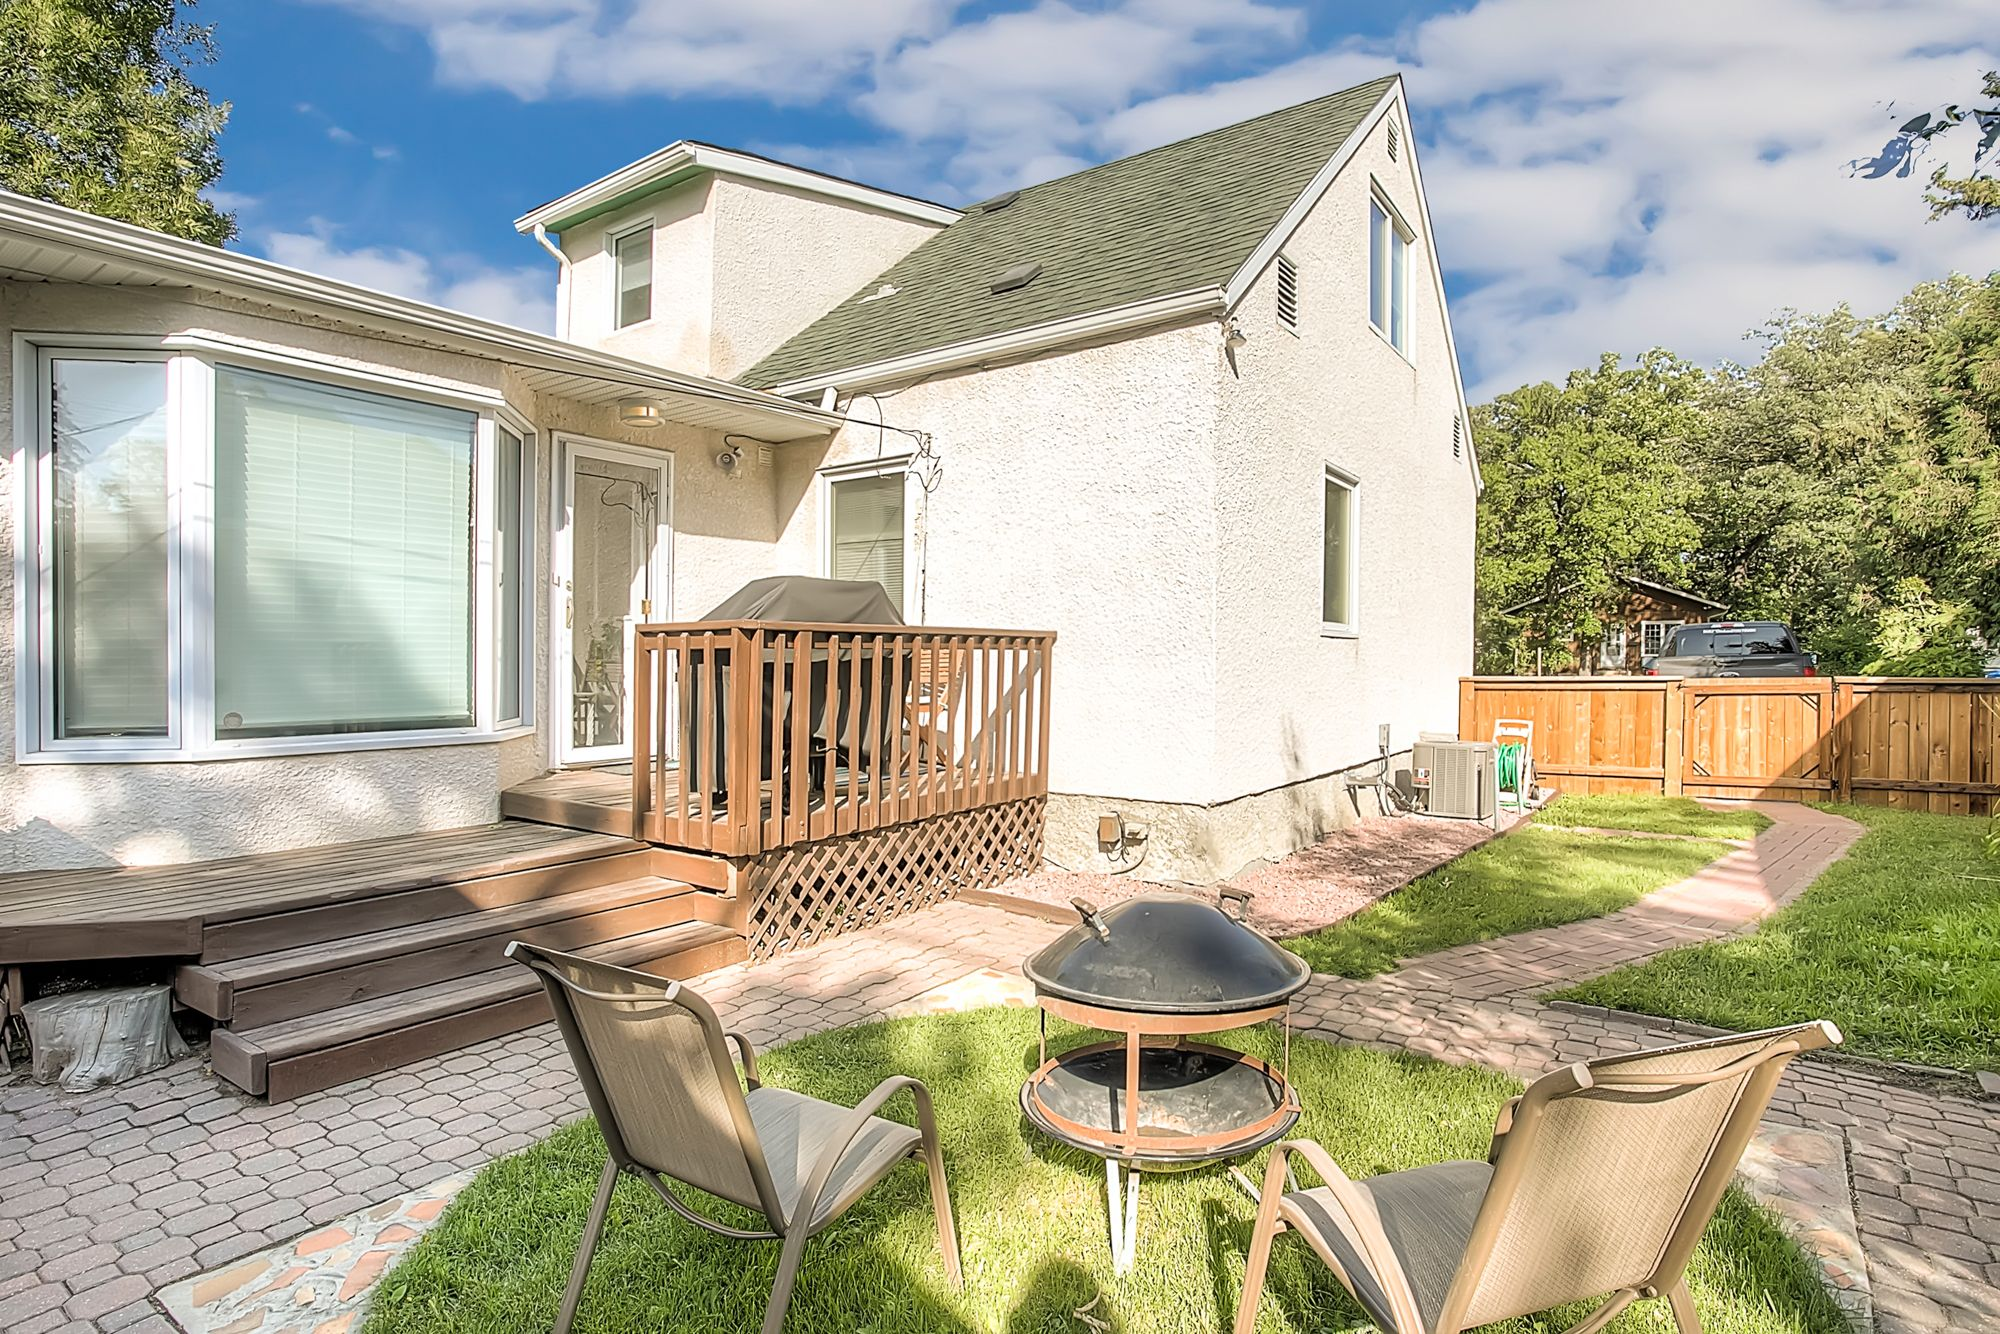 Main Photo: 116 Sunnyside Boulevard in Winnipeg: Woodhaven Single Family Detached for sale (5F)  : MLS®# 1925320